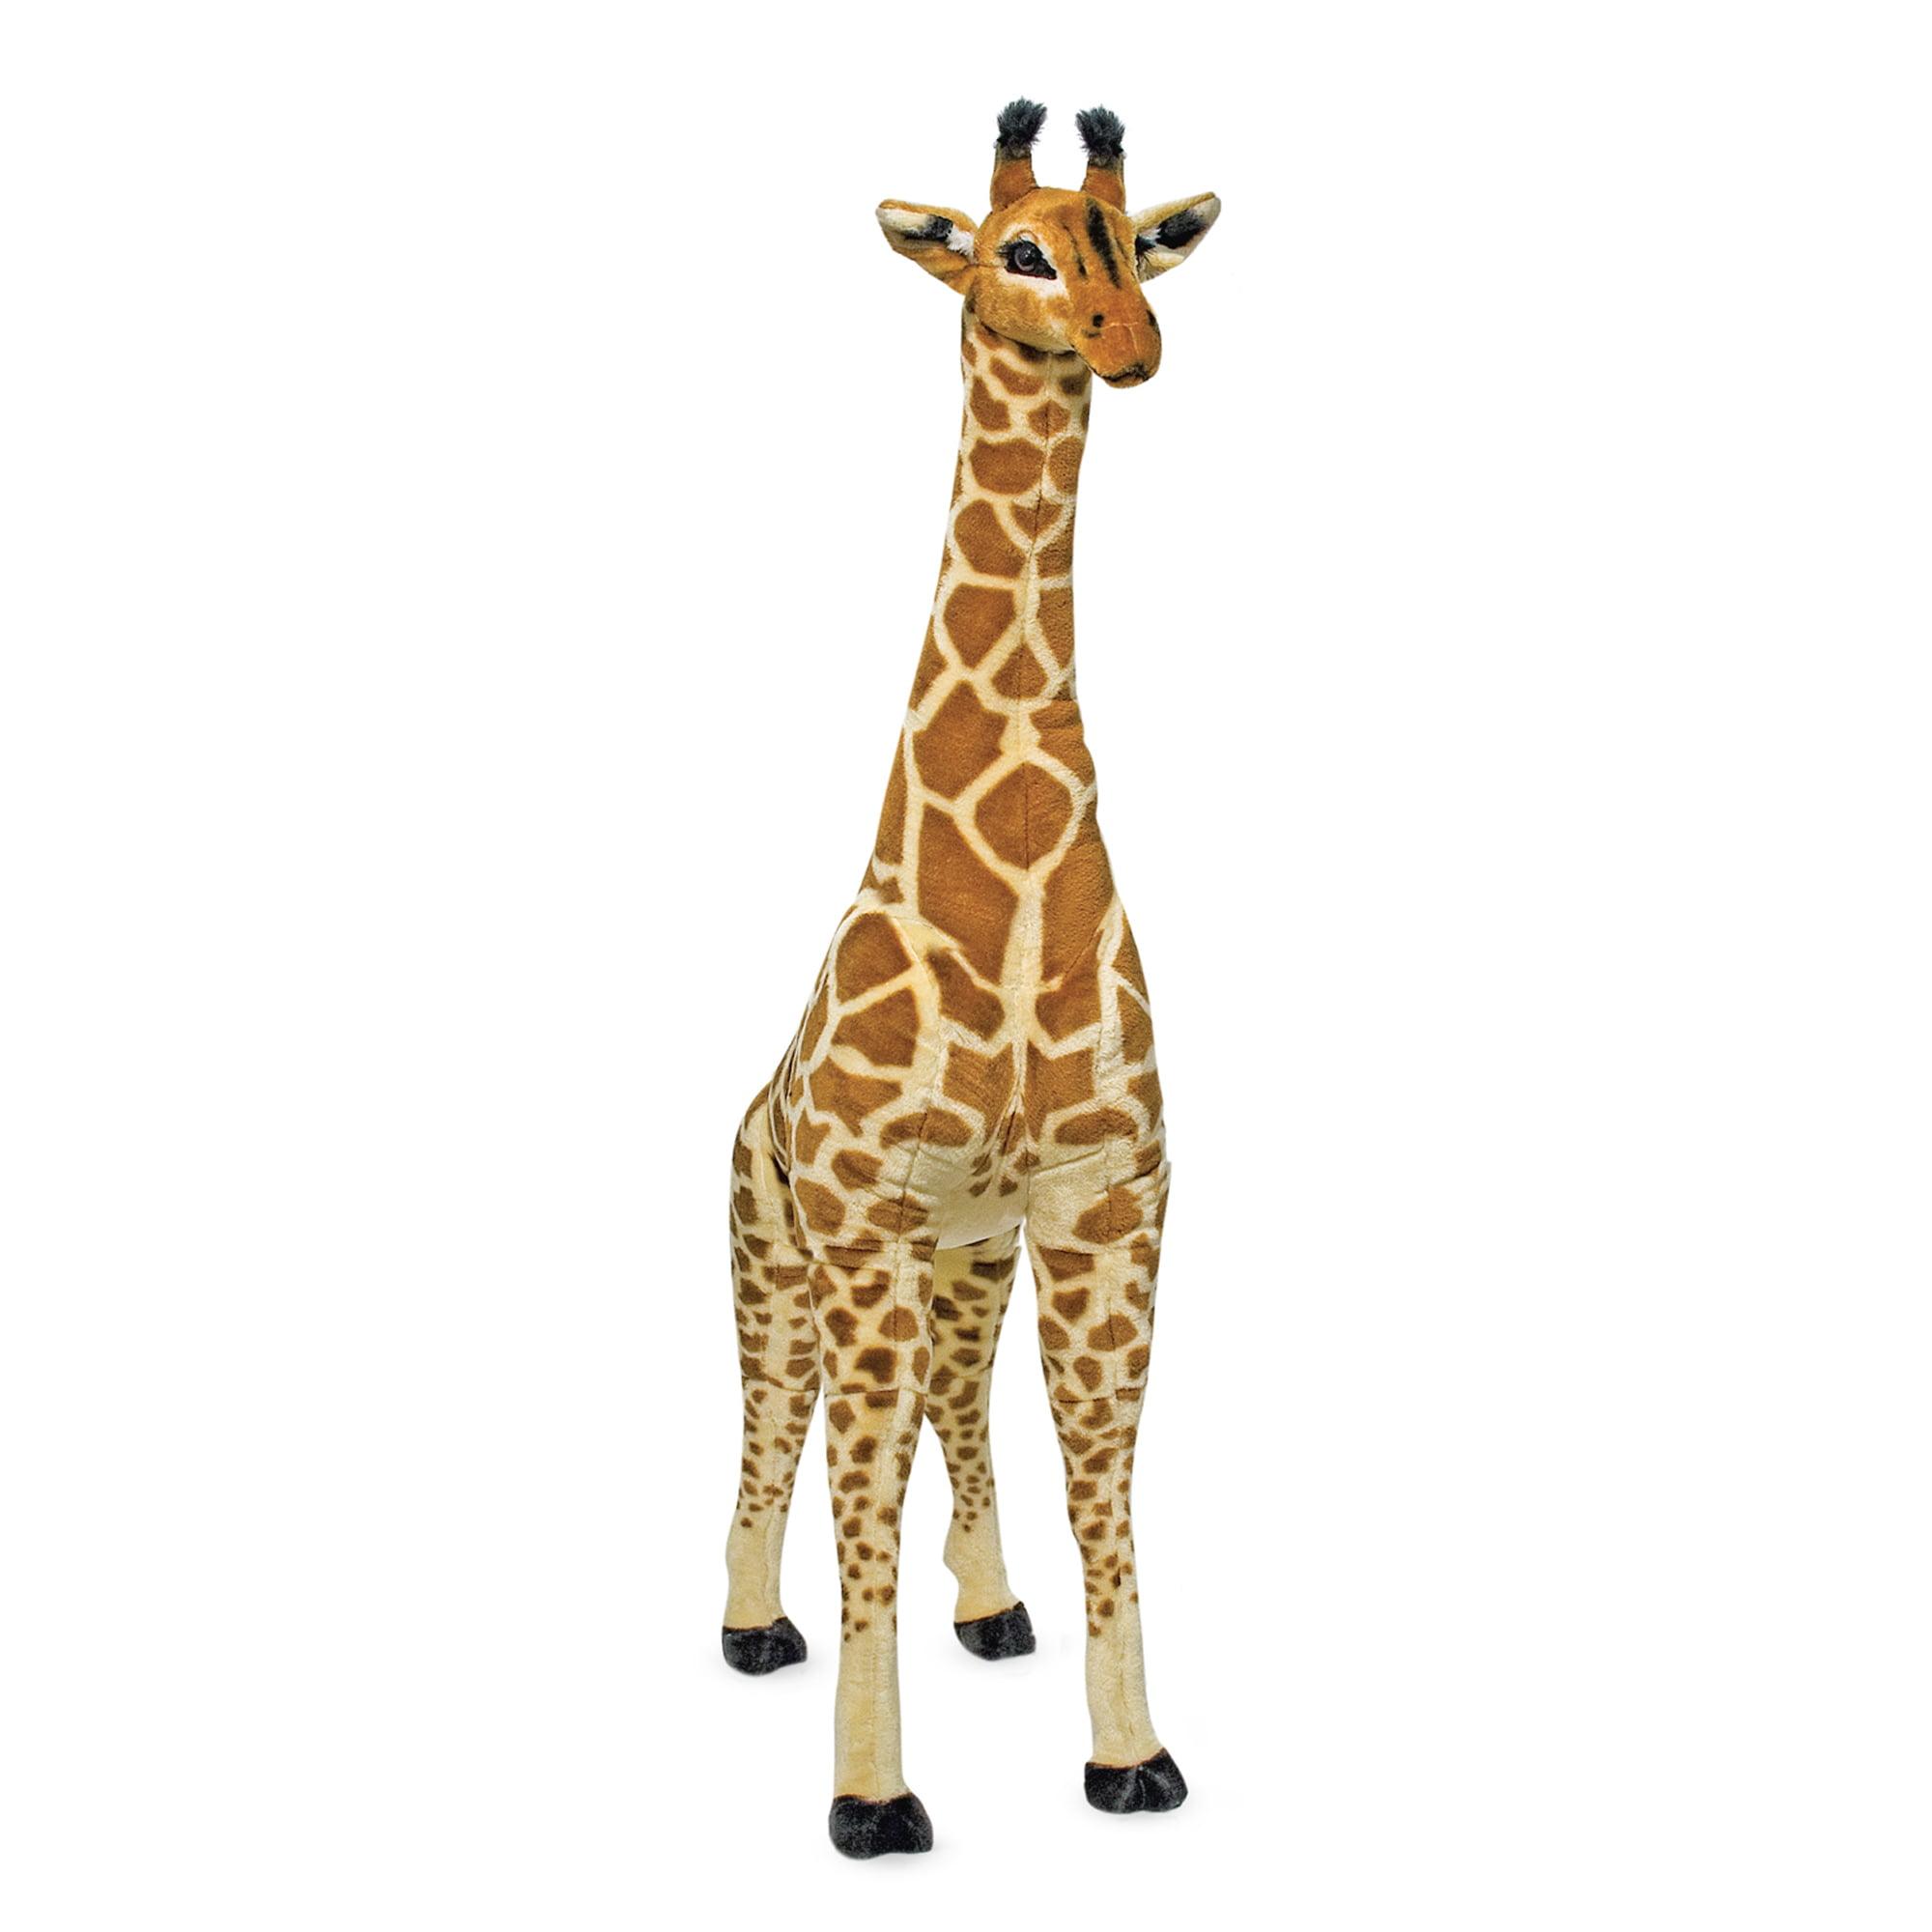 Melissa & Doug Giant Giraffe (Playspaces & Room Decor, Lifelike Stuffed Animal, Soft Fabric, Over 4 Feet Tall) by Melissa & Doug